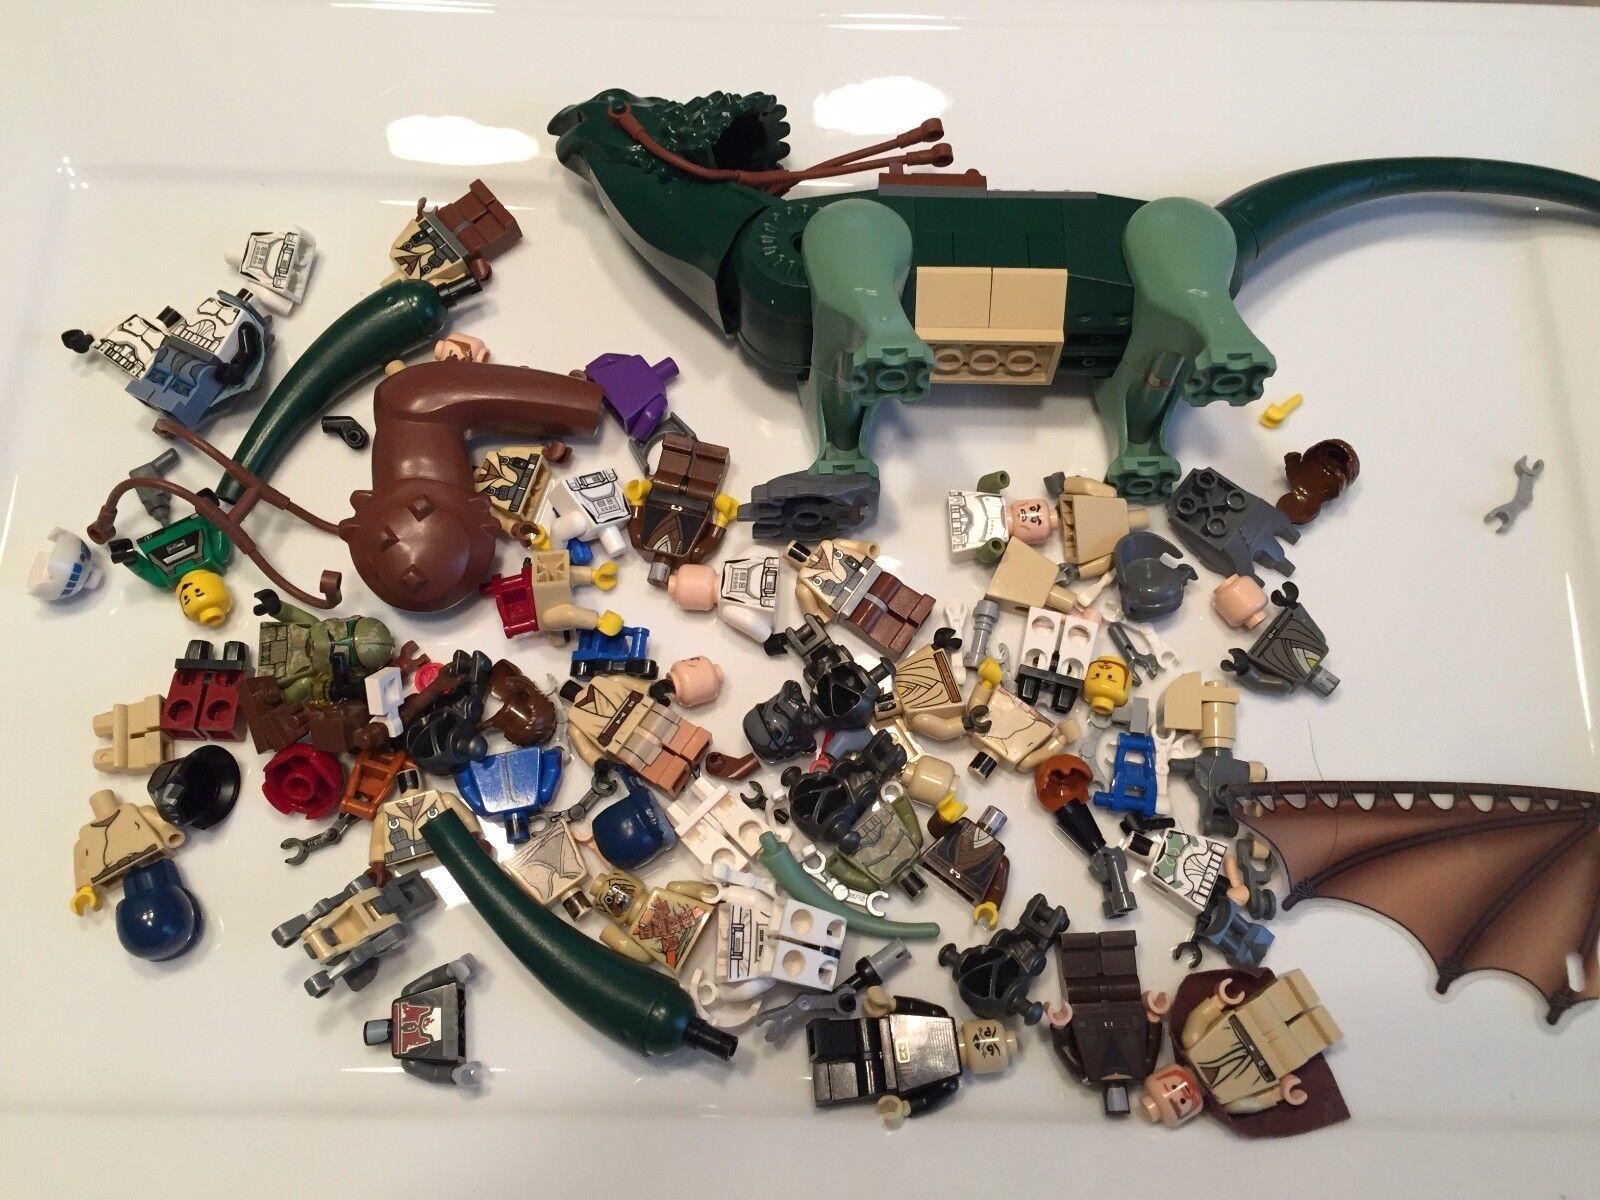 8 Ounces Lego Star Wars Minifig parts Boga 1/2 Pound minifigures Lot N338